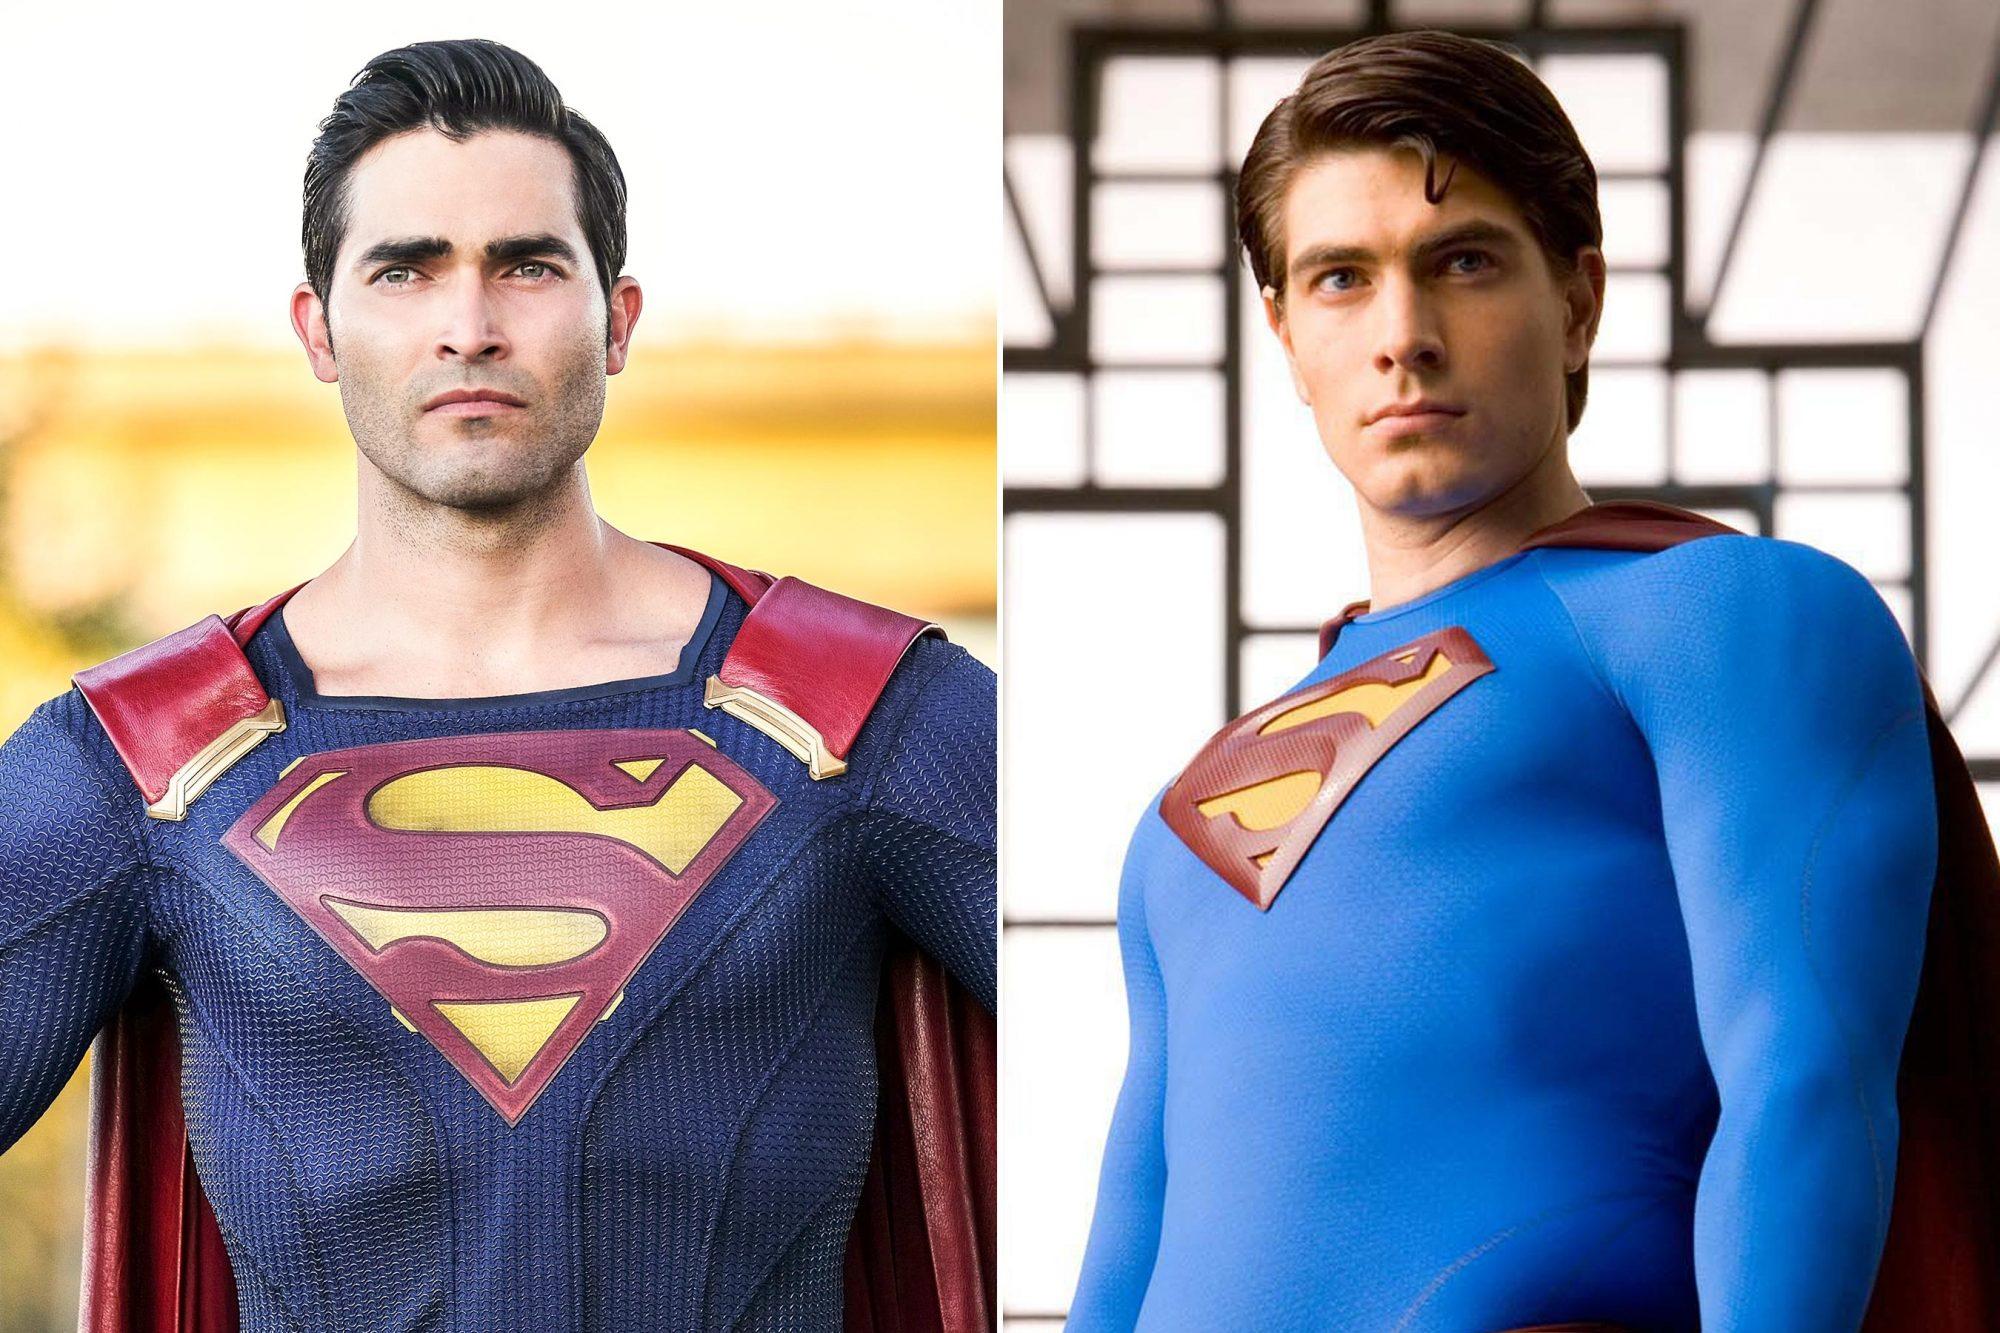 Superman: Tyler Hoechlin; Brandon Routh